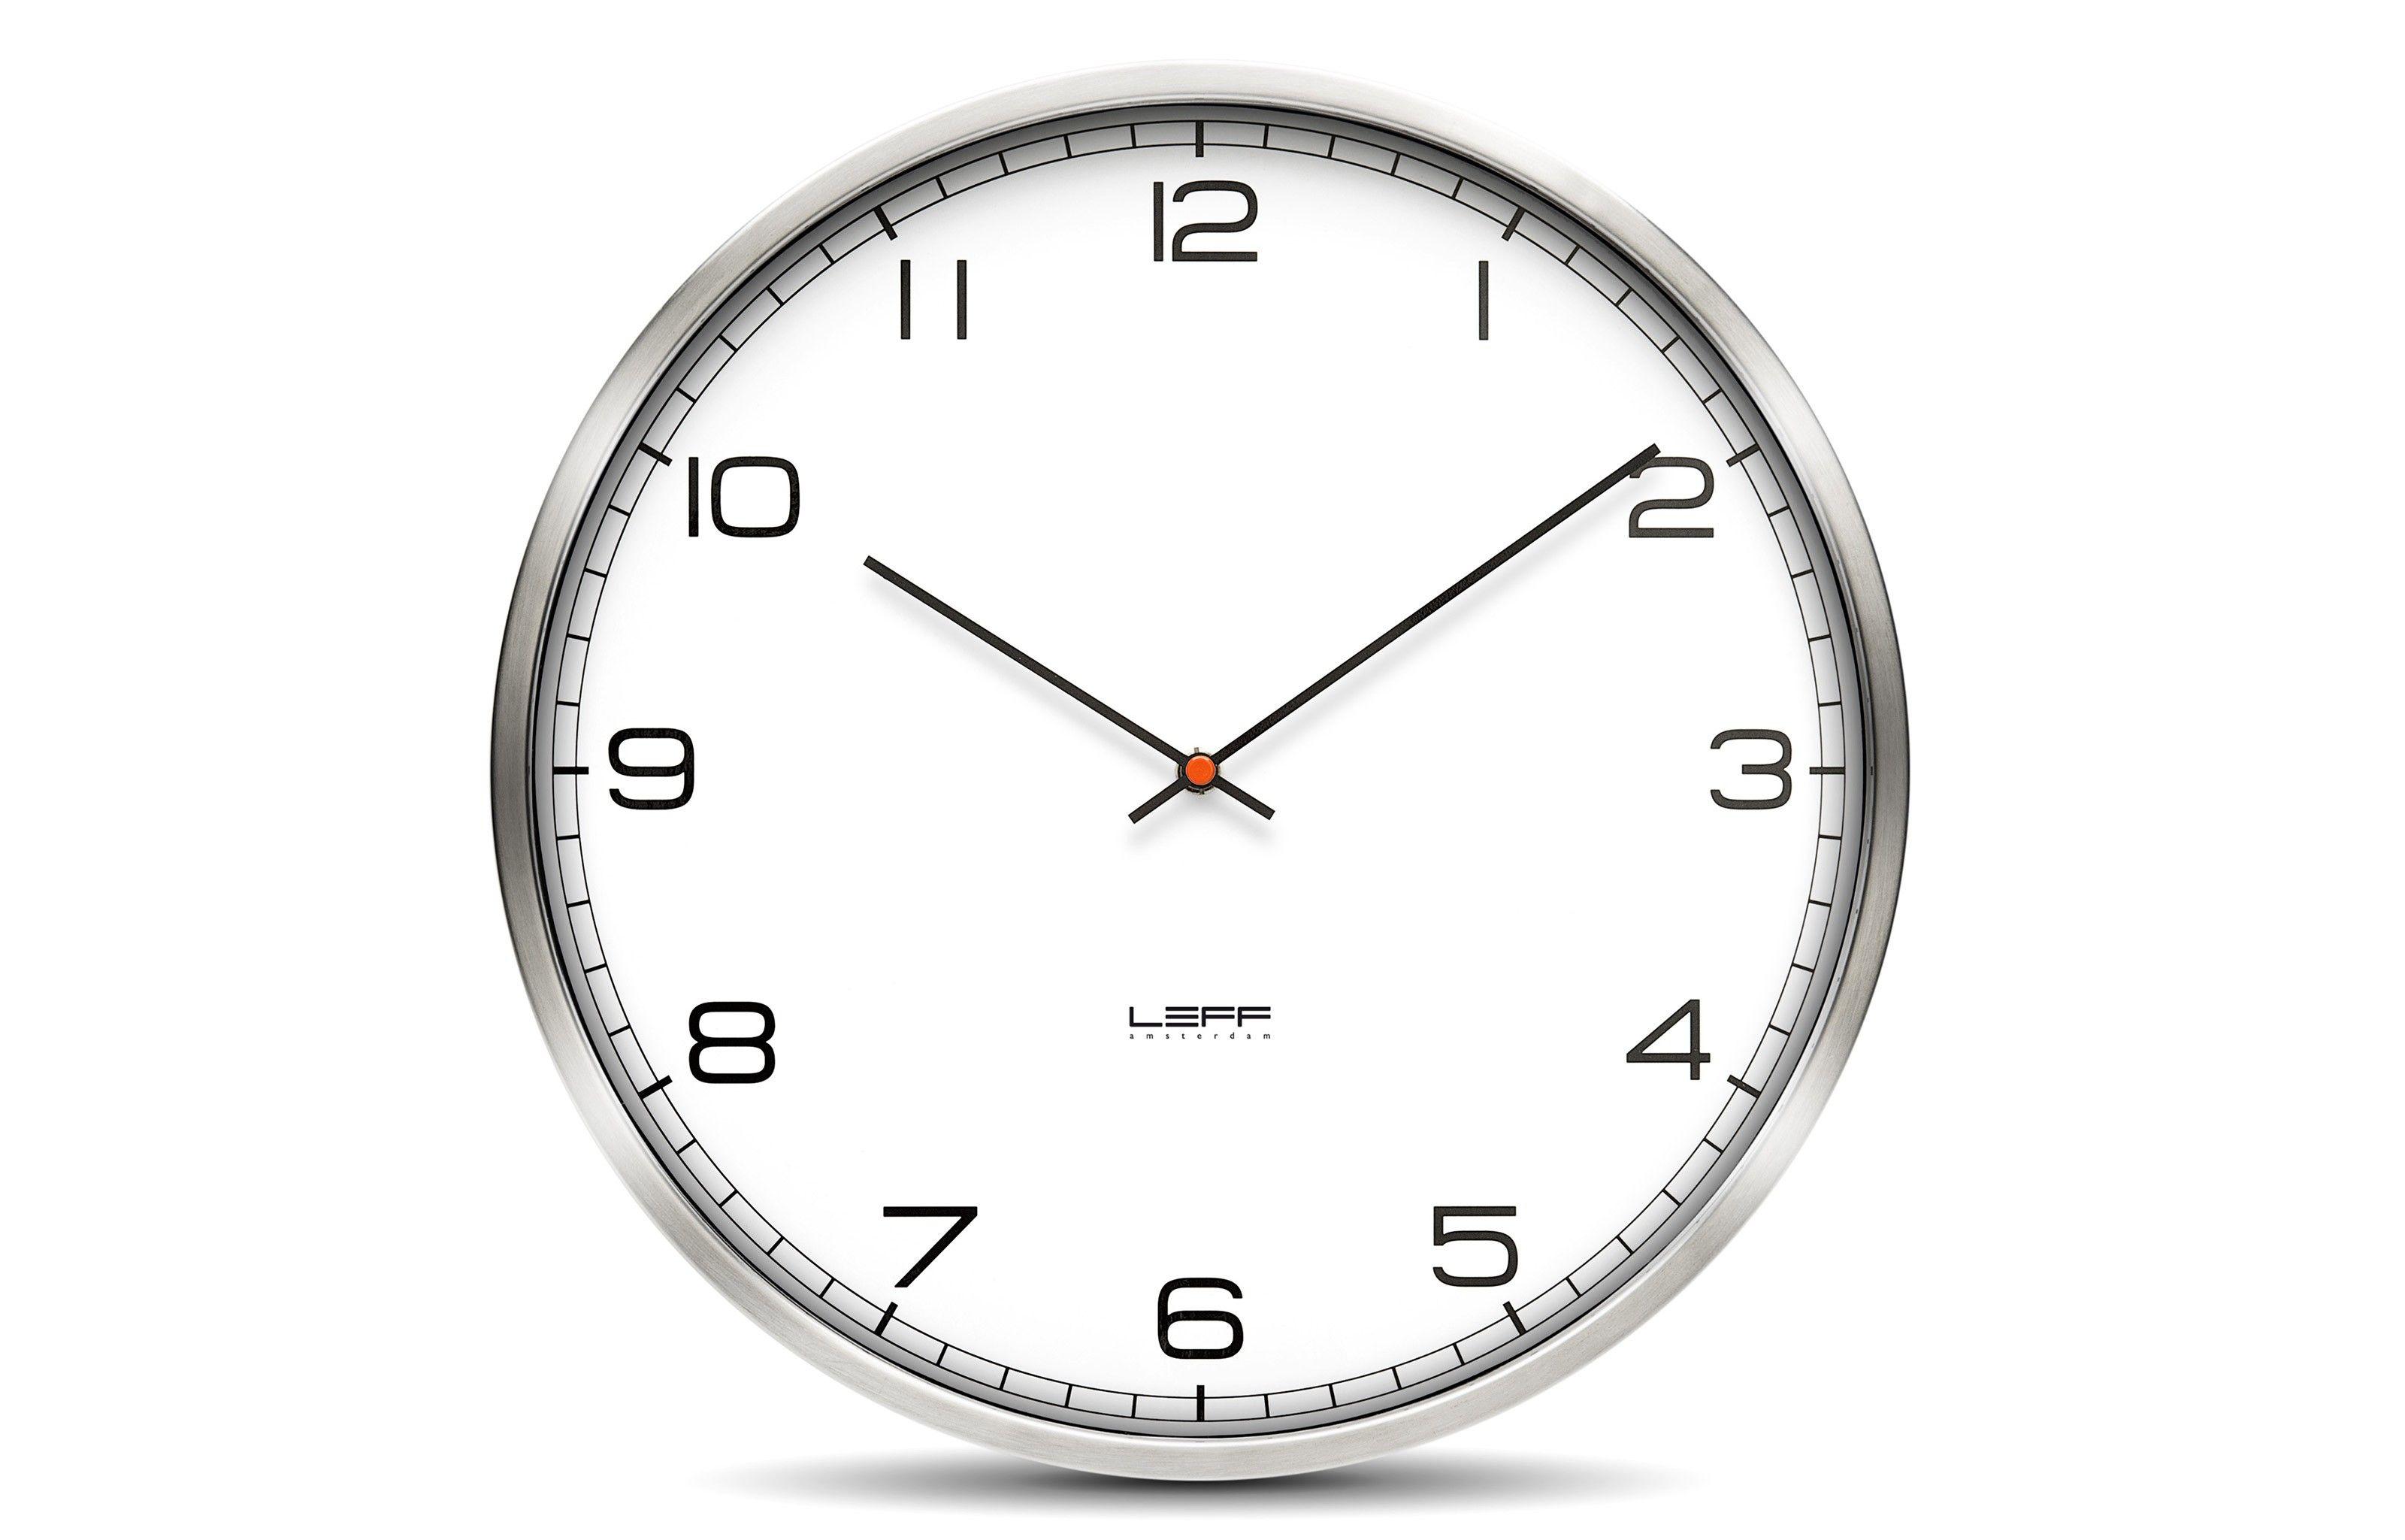 One Arabic Wall Clock Viesso 79 00 Wall Clock Contemporary Wall Clock White Wall Clocks